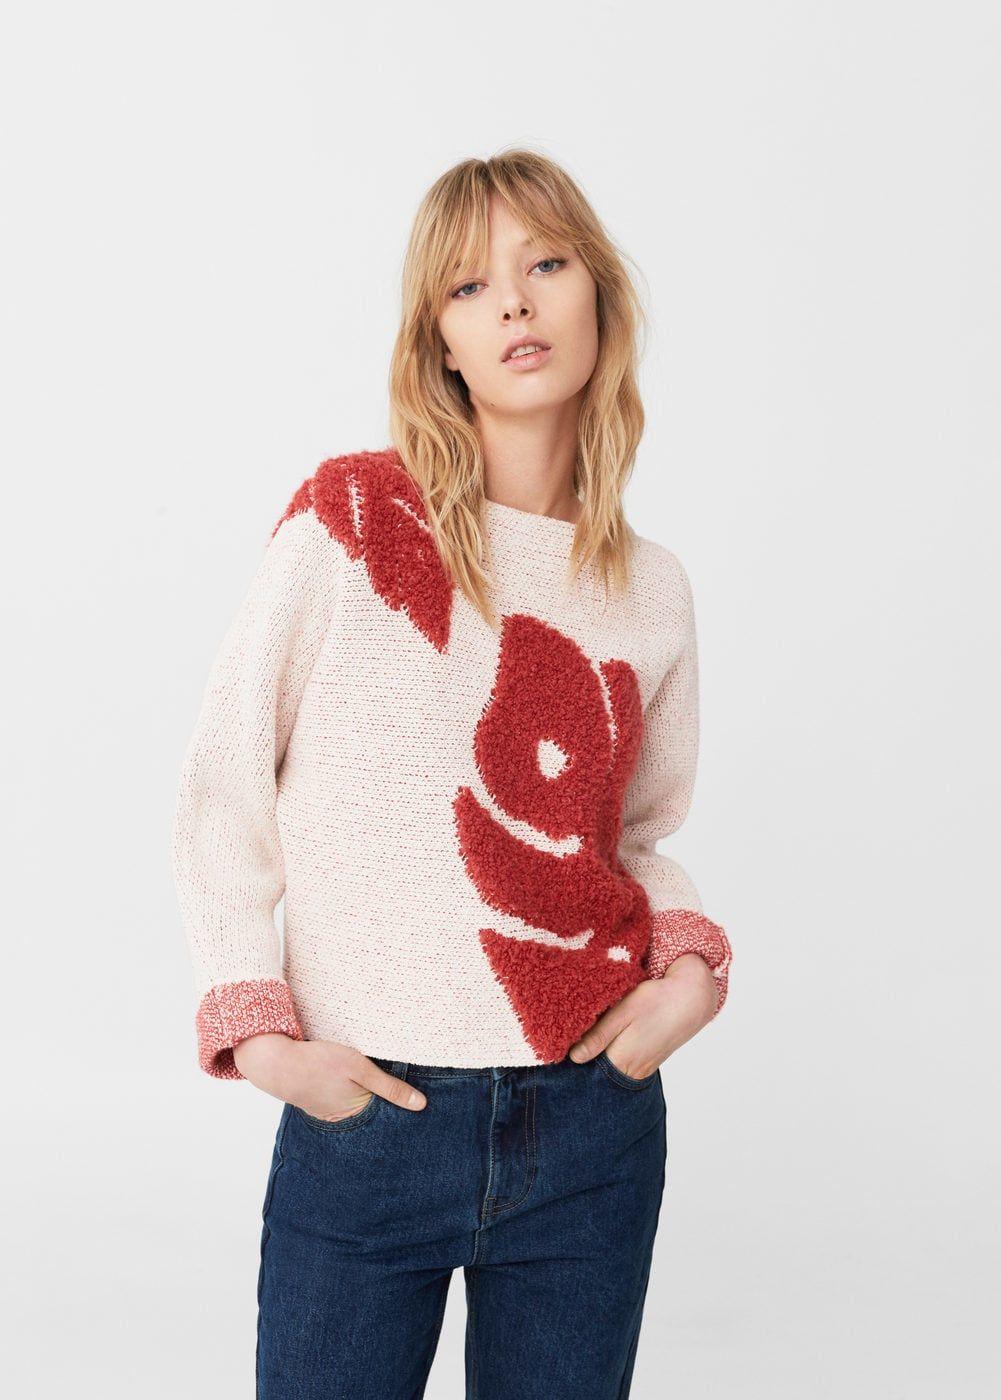 Textured cotton sweater | Cotton sweater, Cotton and Fall winter ...